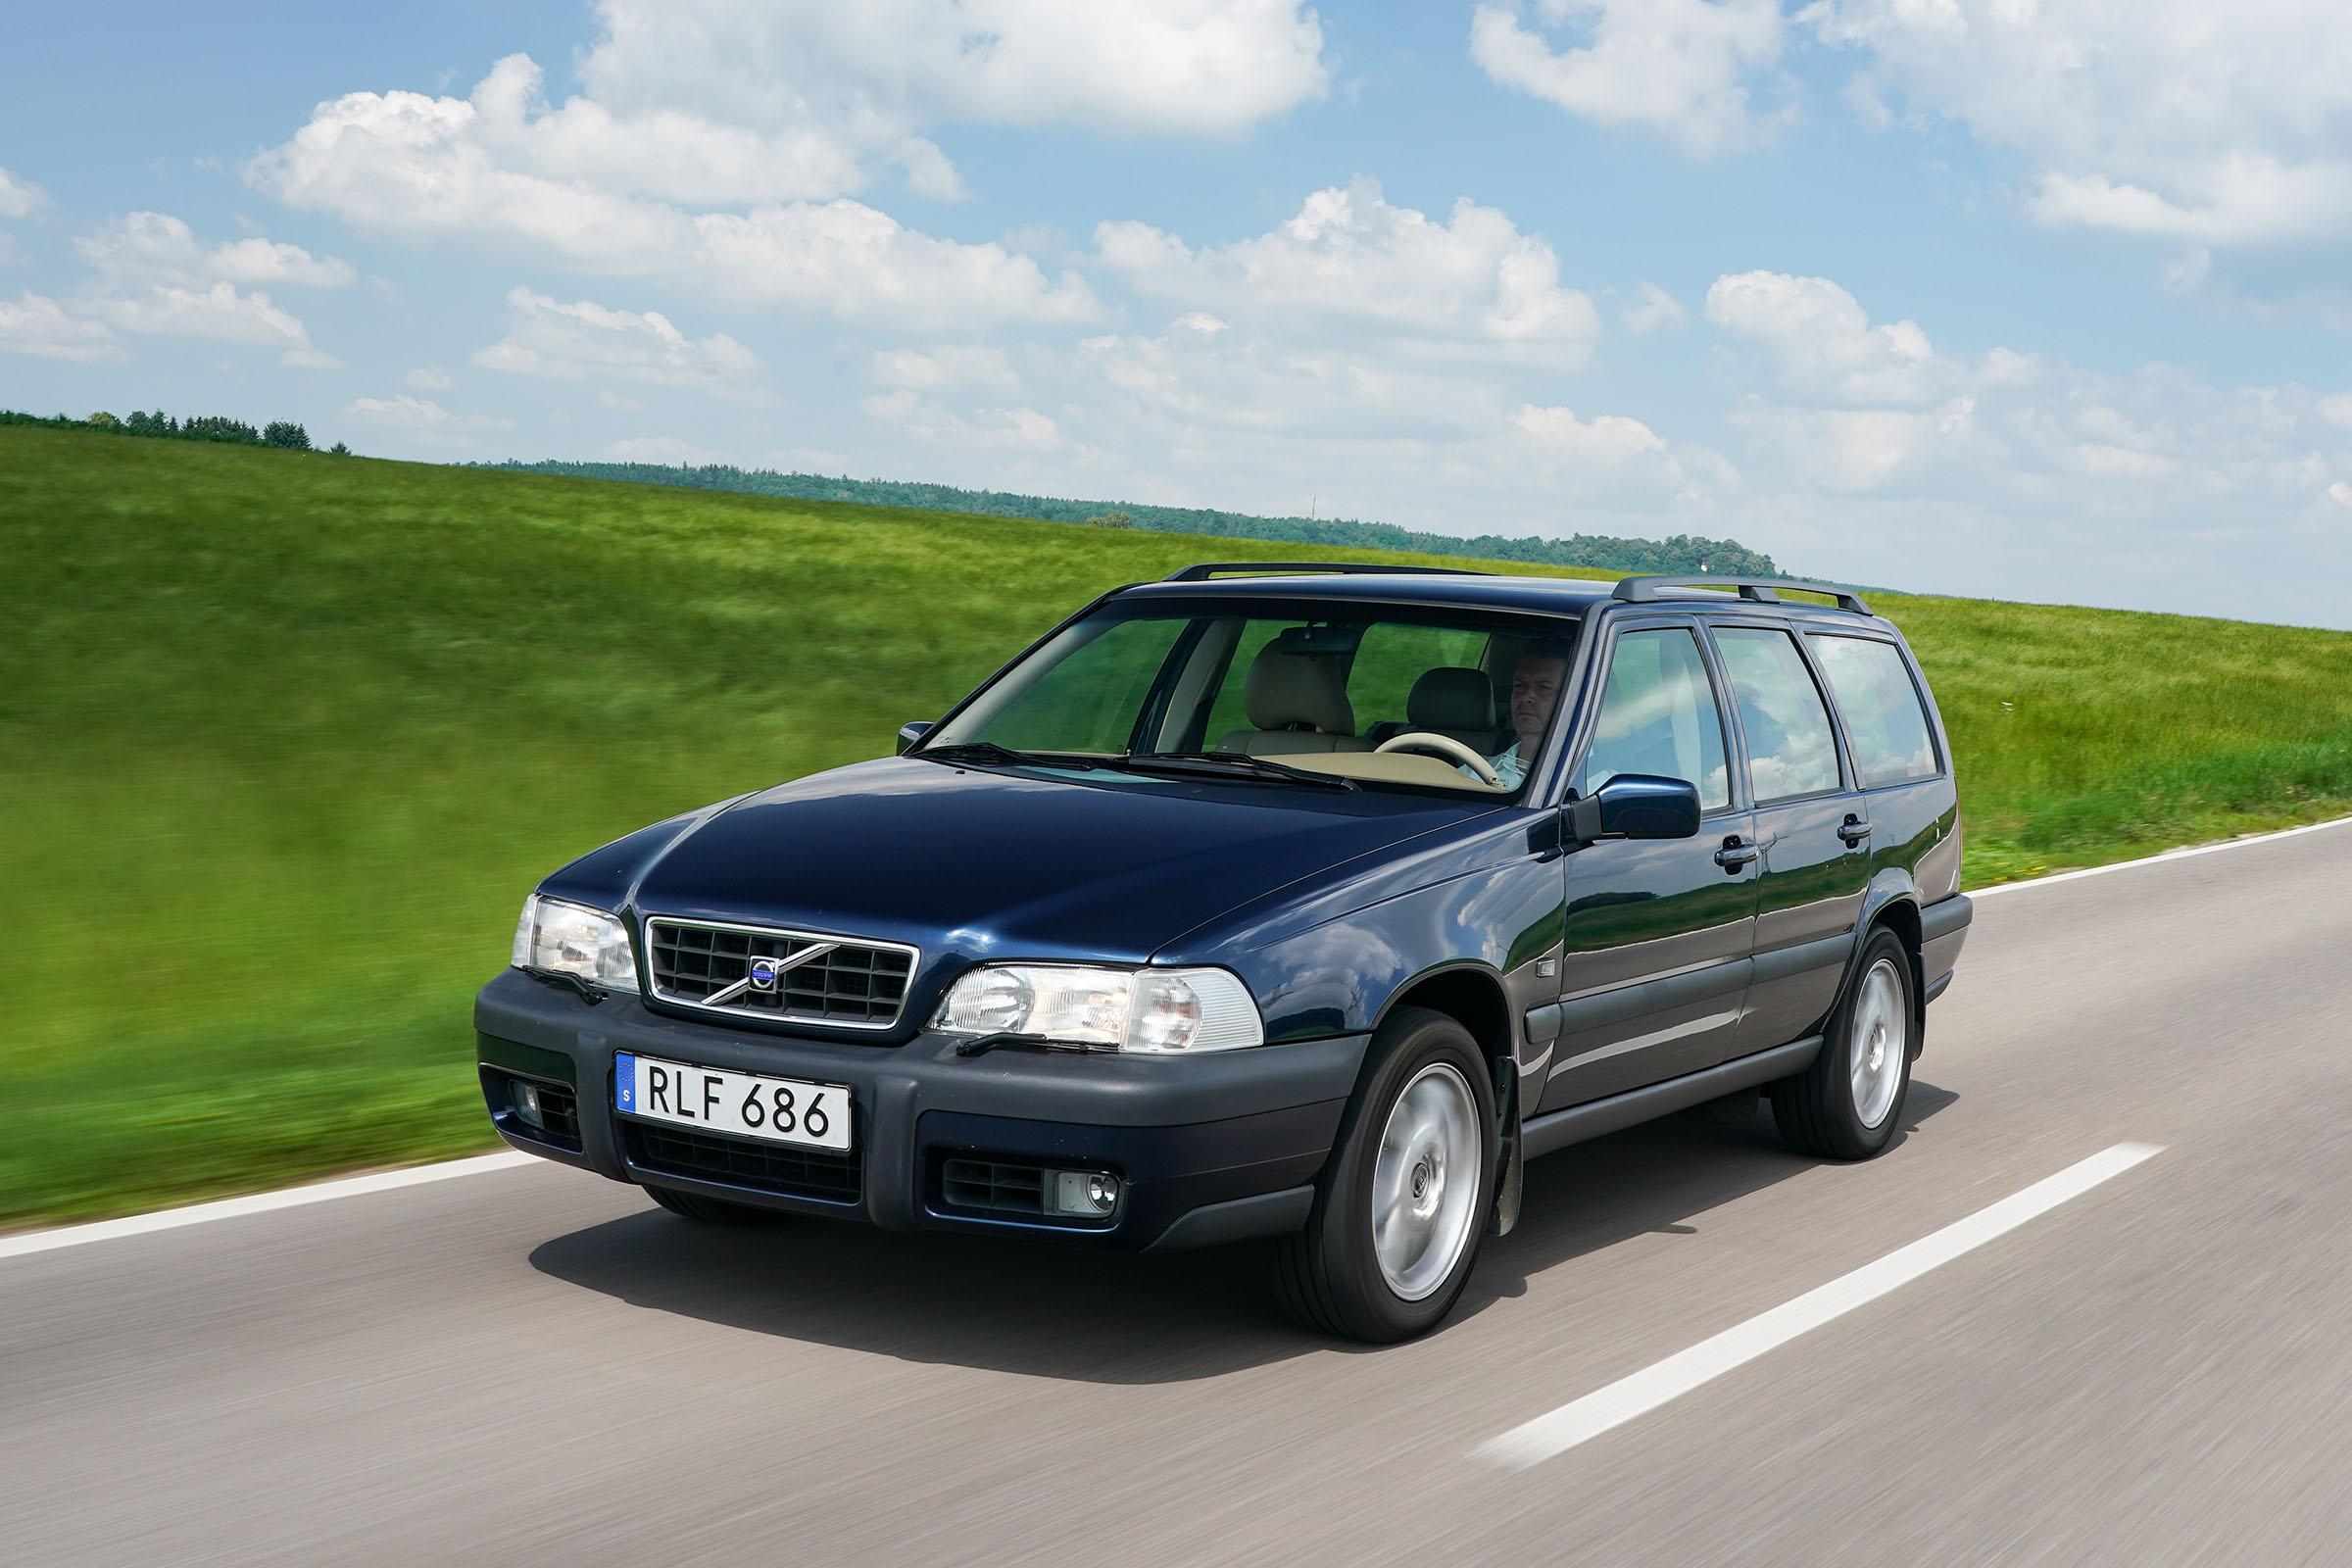 Volvo-Cross-Country-V70XC-Dynamic